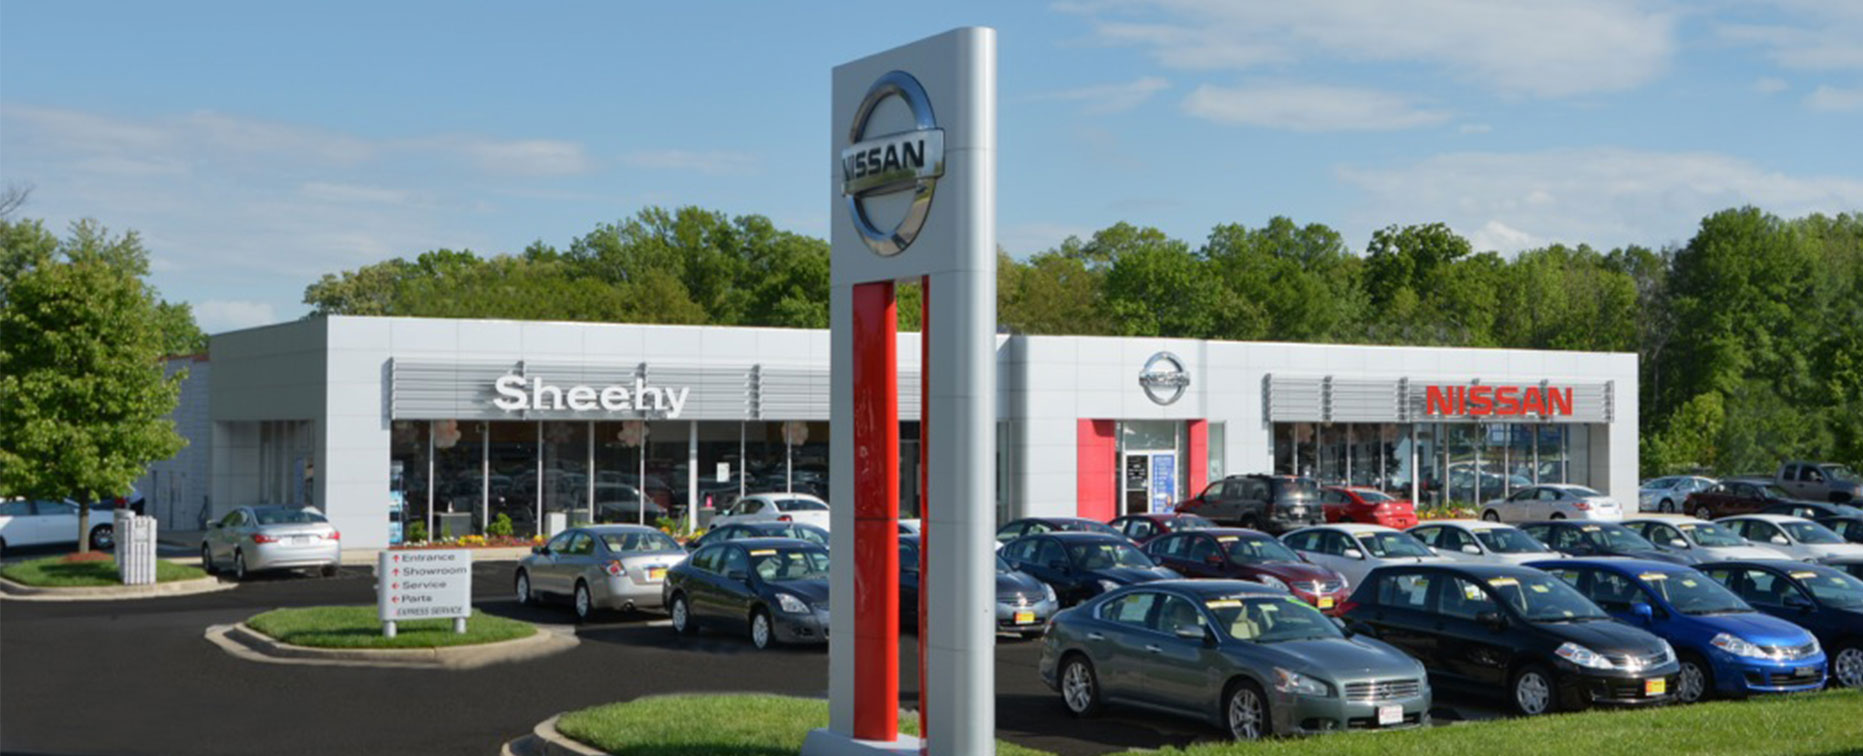 Richmond Ford Lincoln Richmond Va >> Sheehy Auto Stores